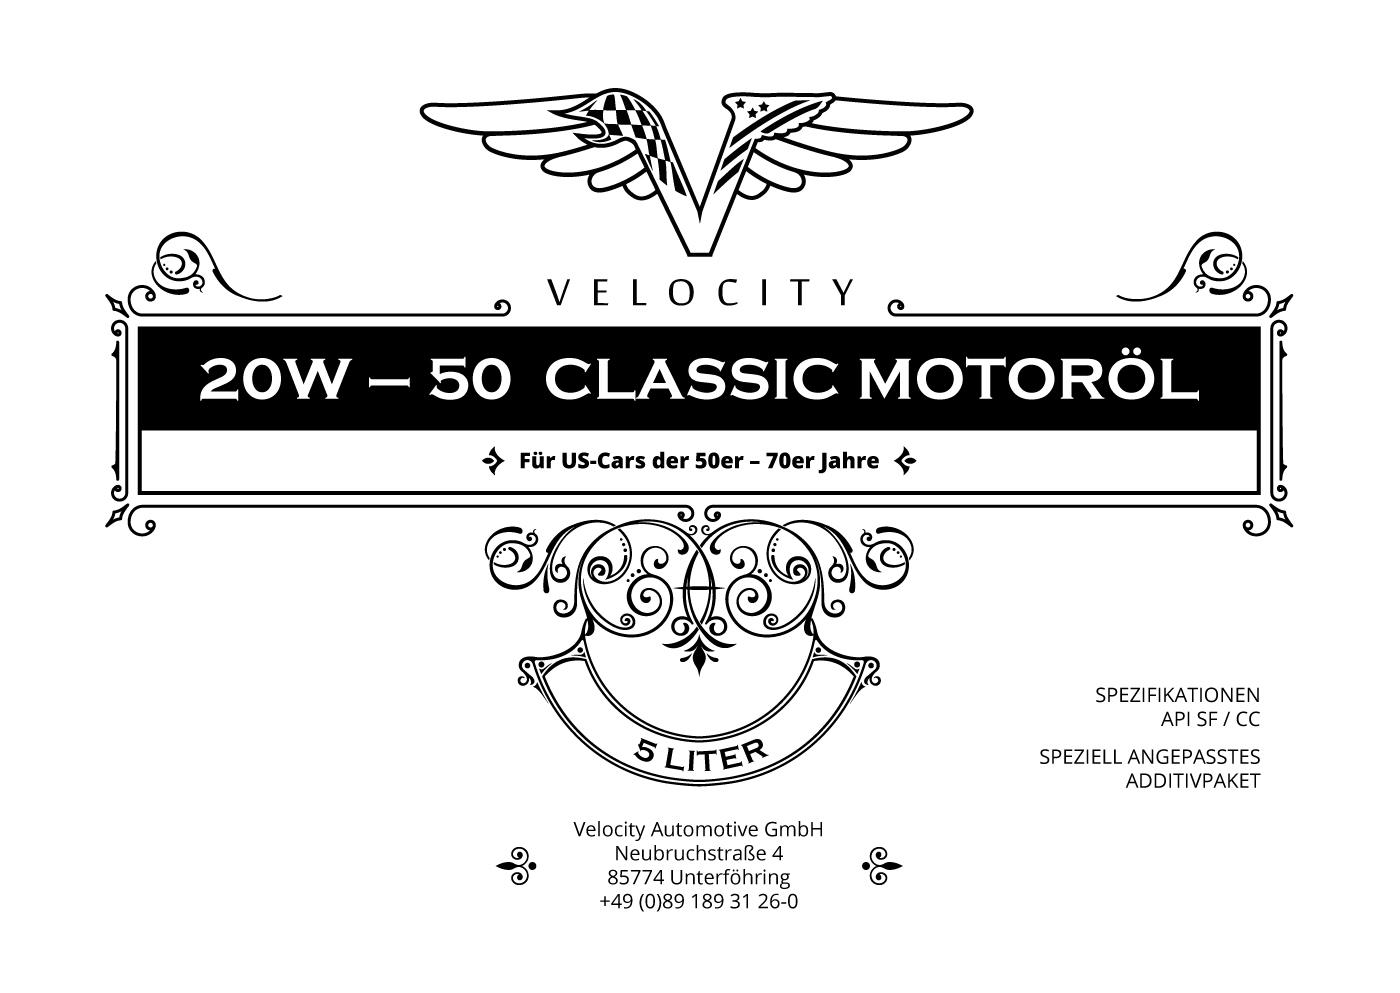 Engine Oil - Velocity US-Car Vintage 20W50 5L